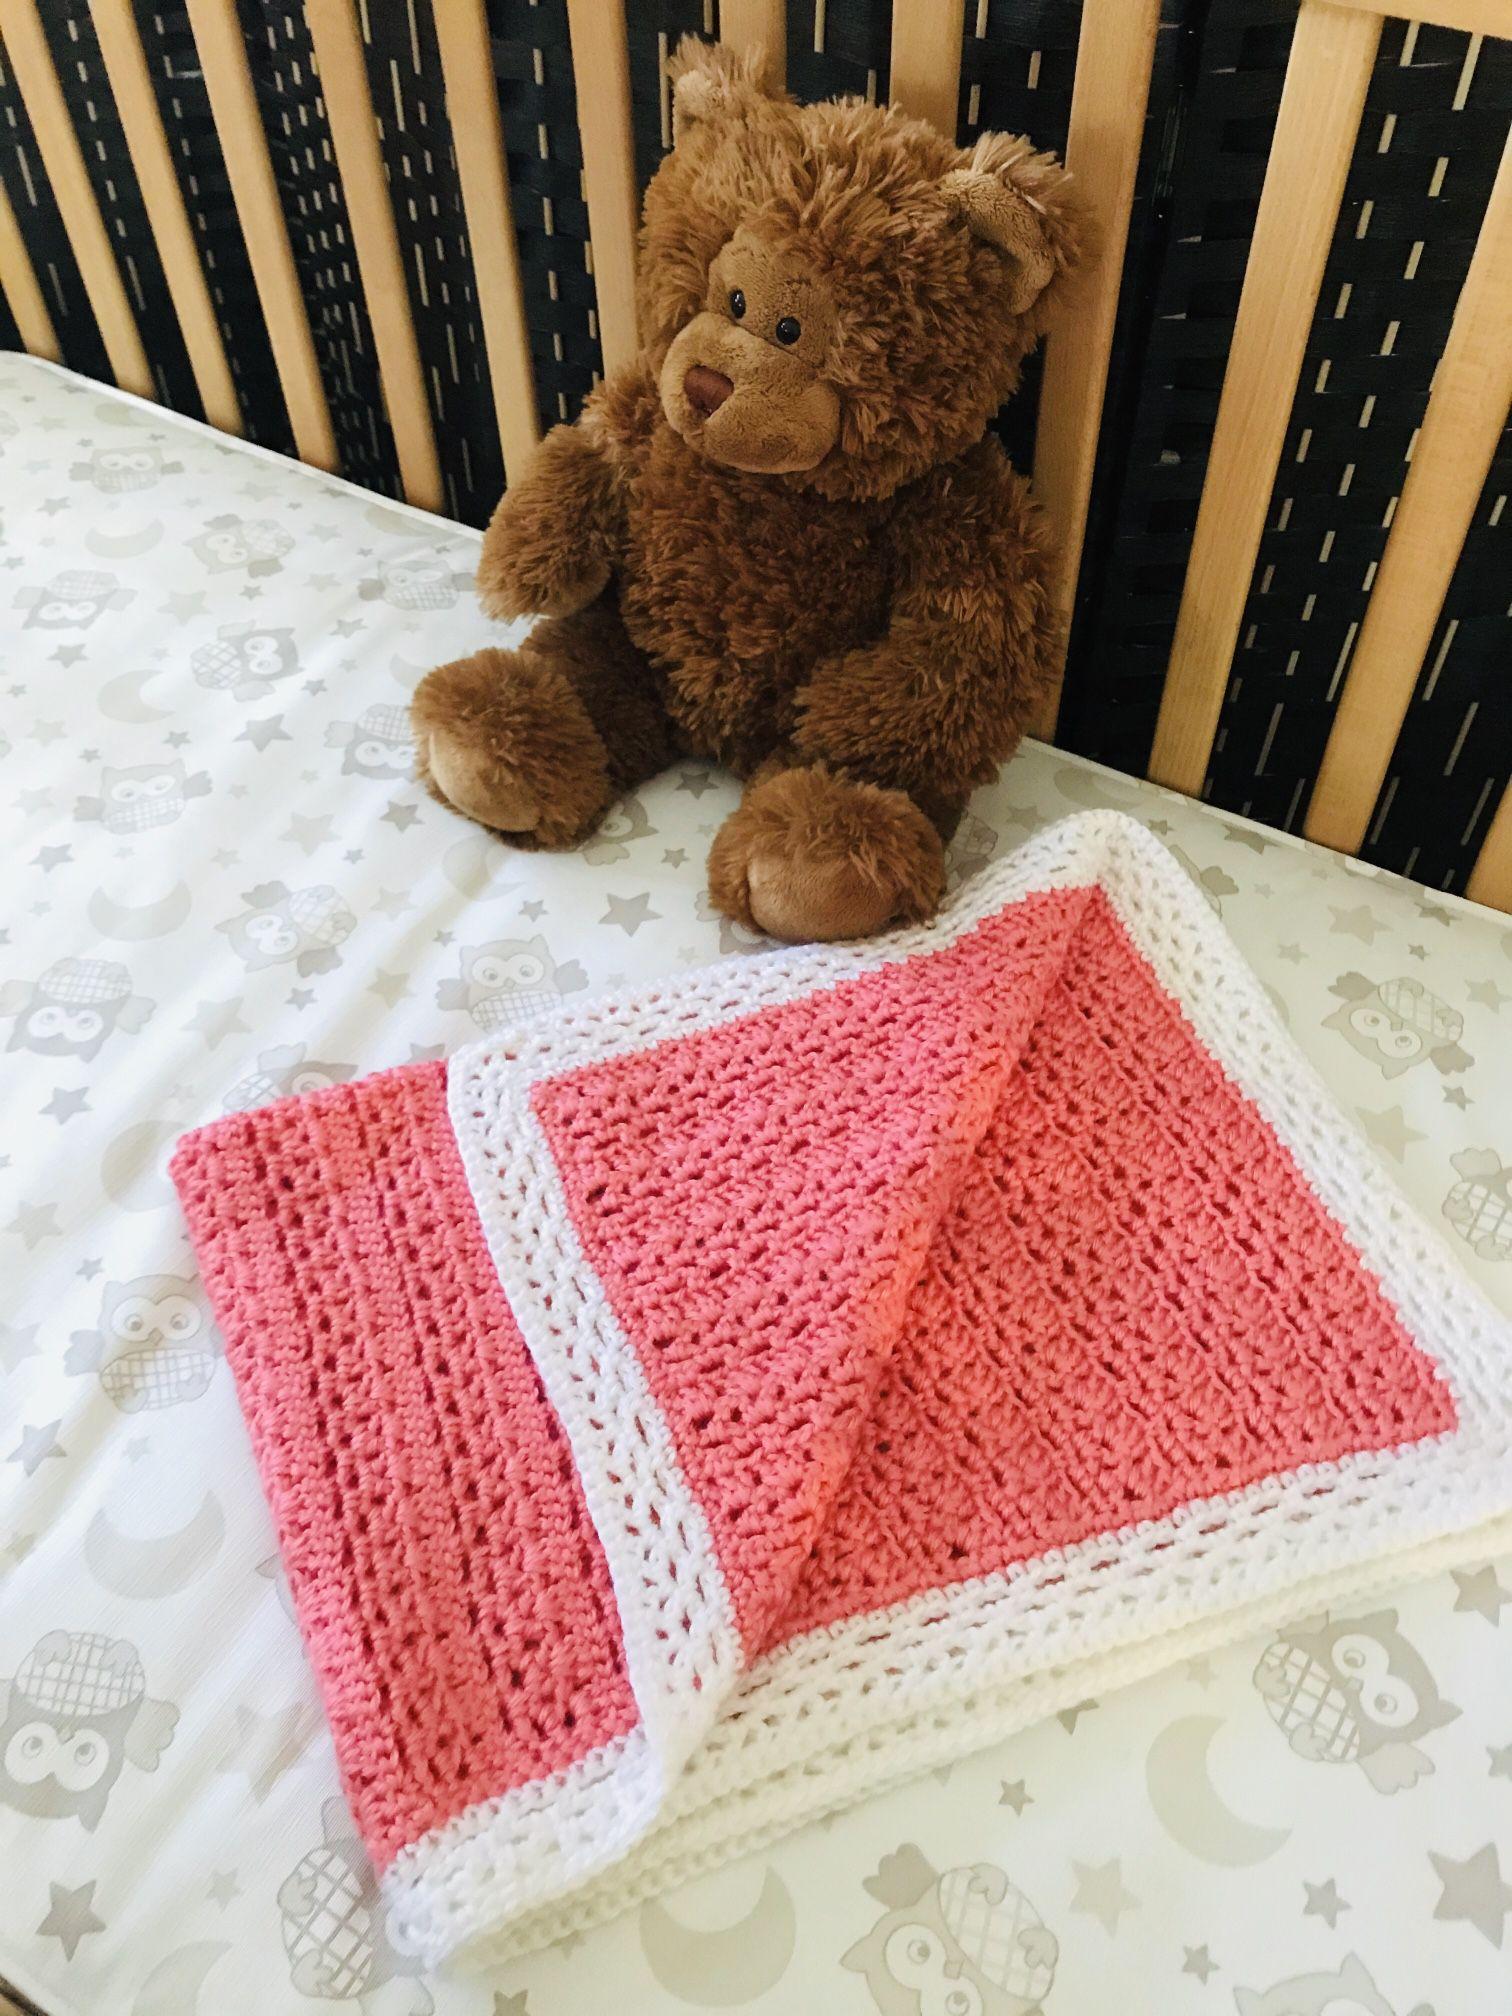 Handmade Baby Blanket Crochet In Coral